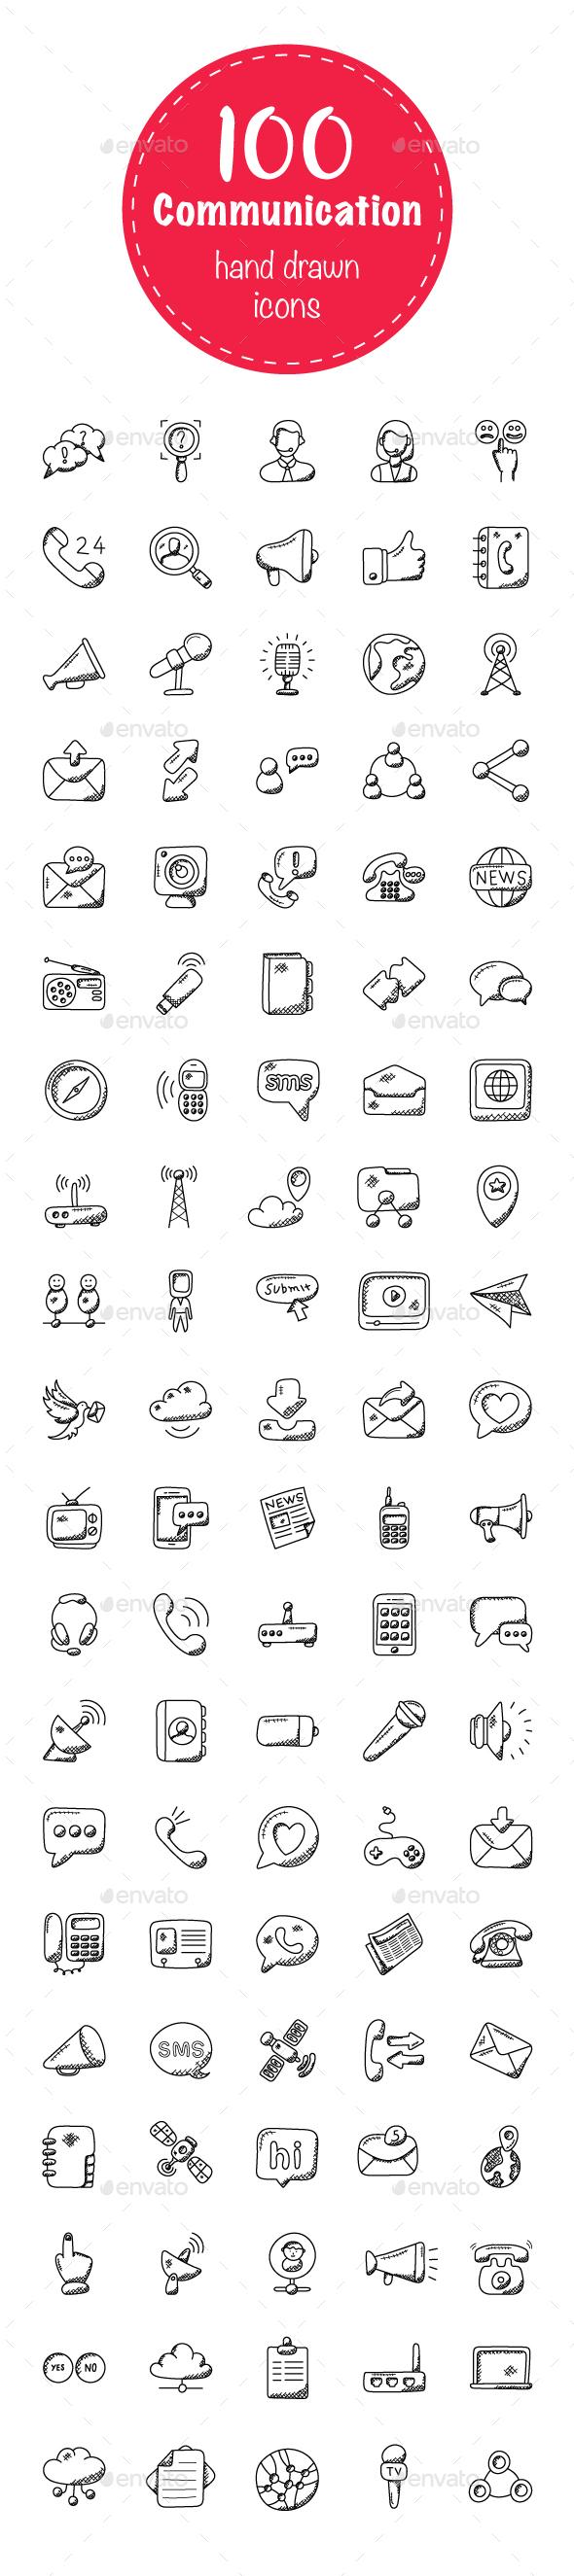 100 Communication Doodle Icons - Icons